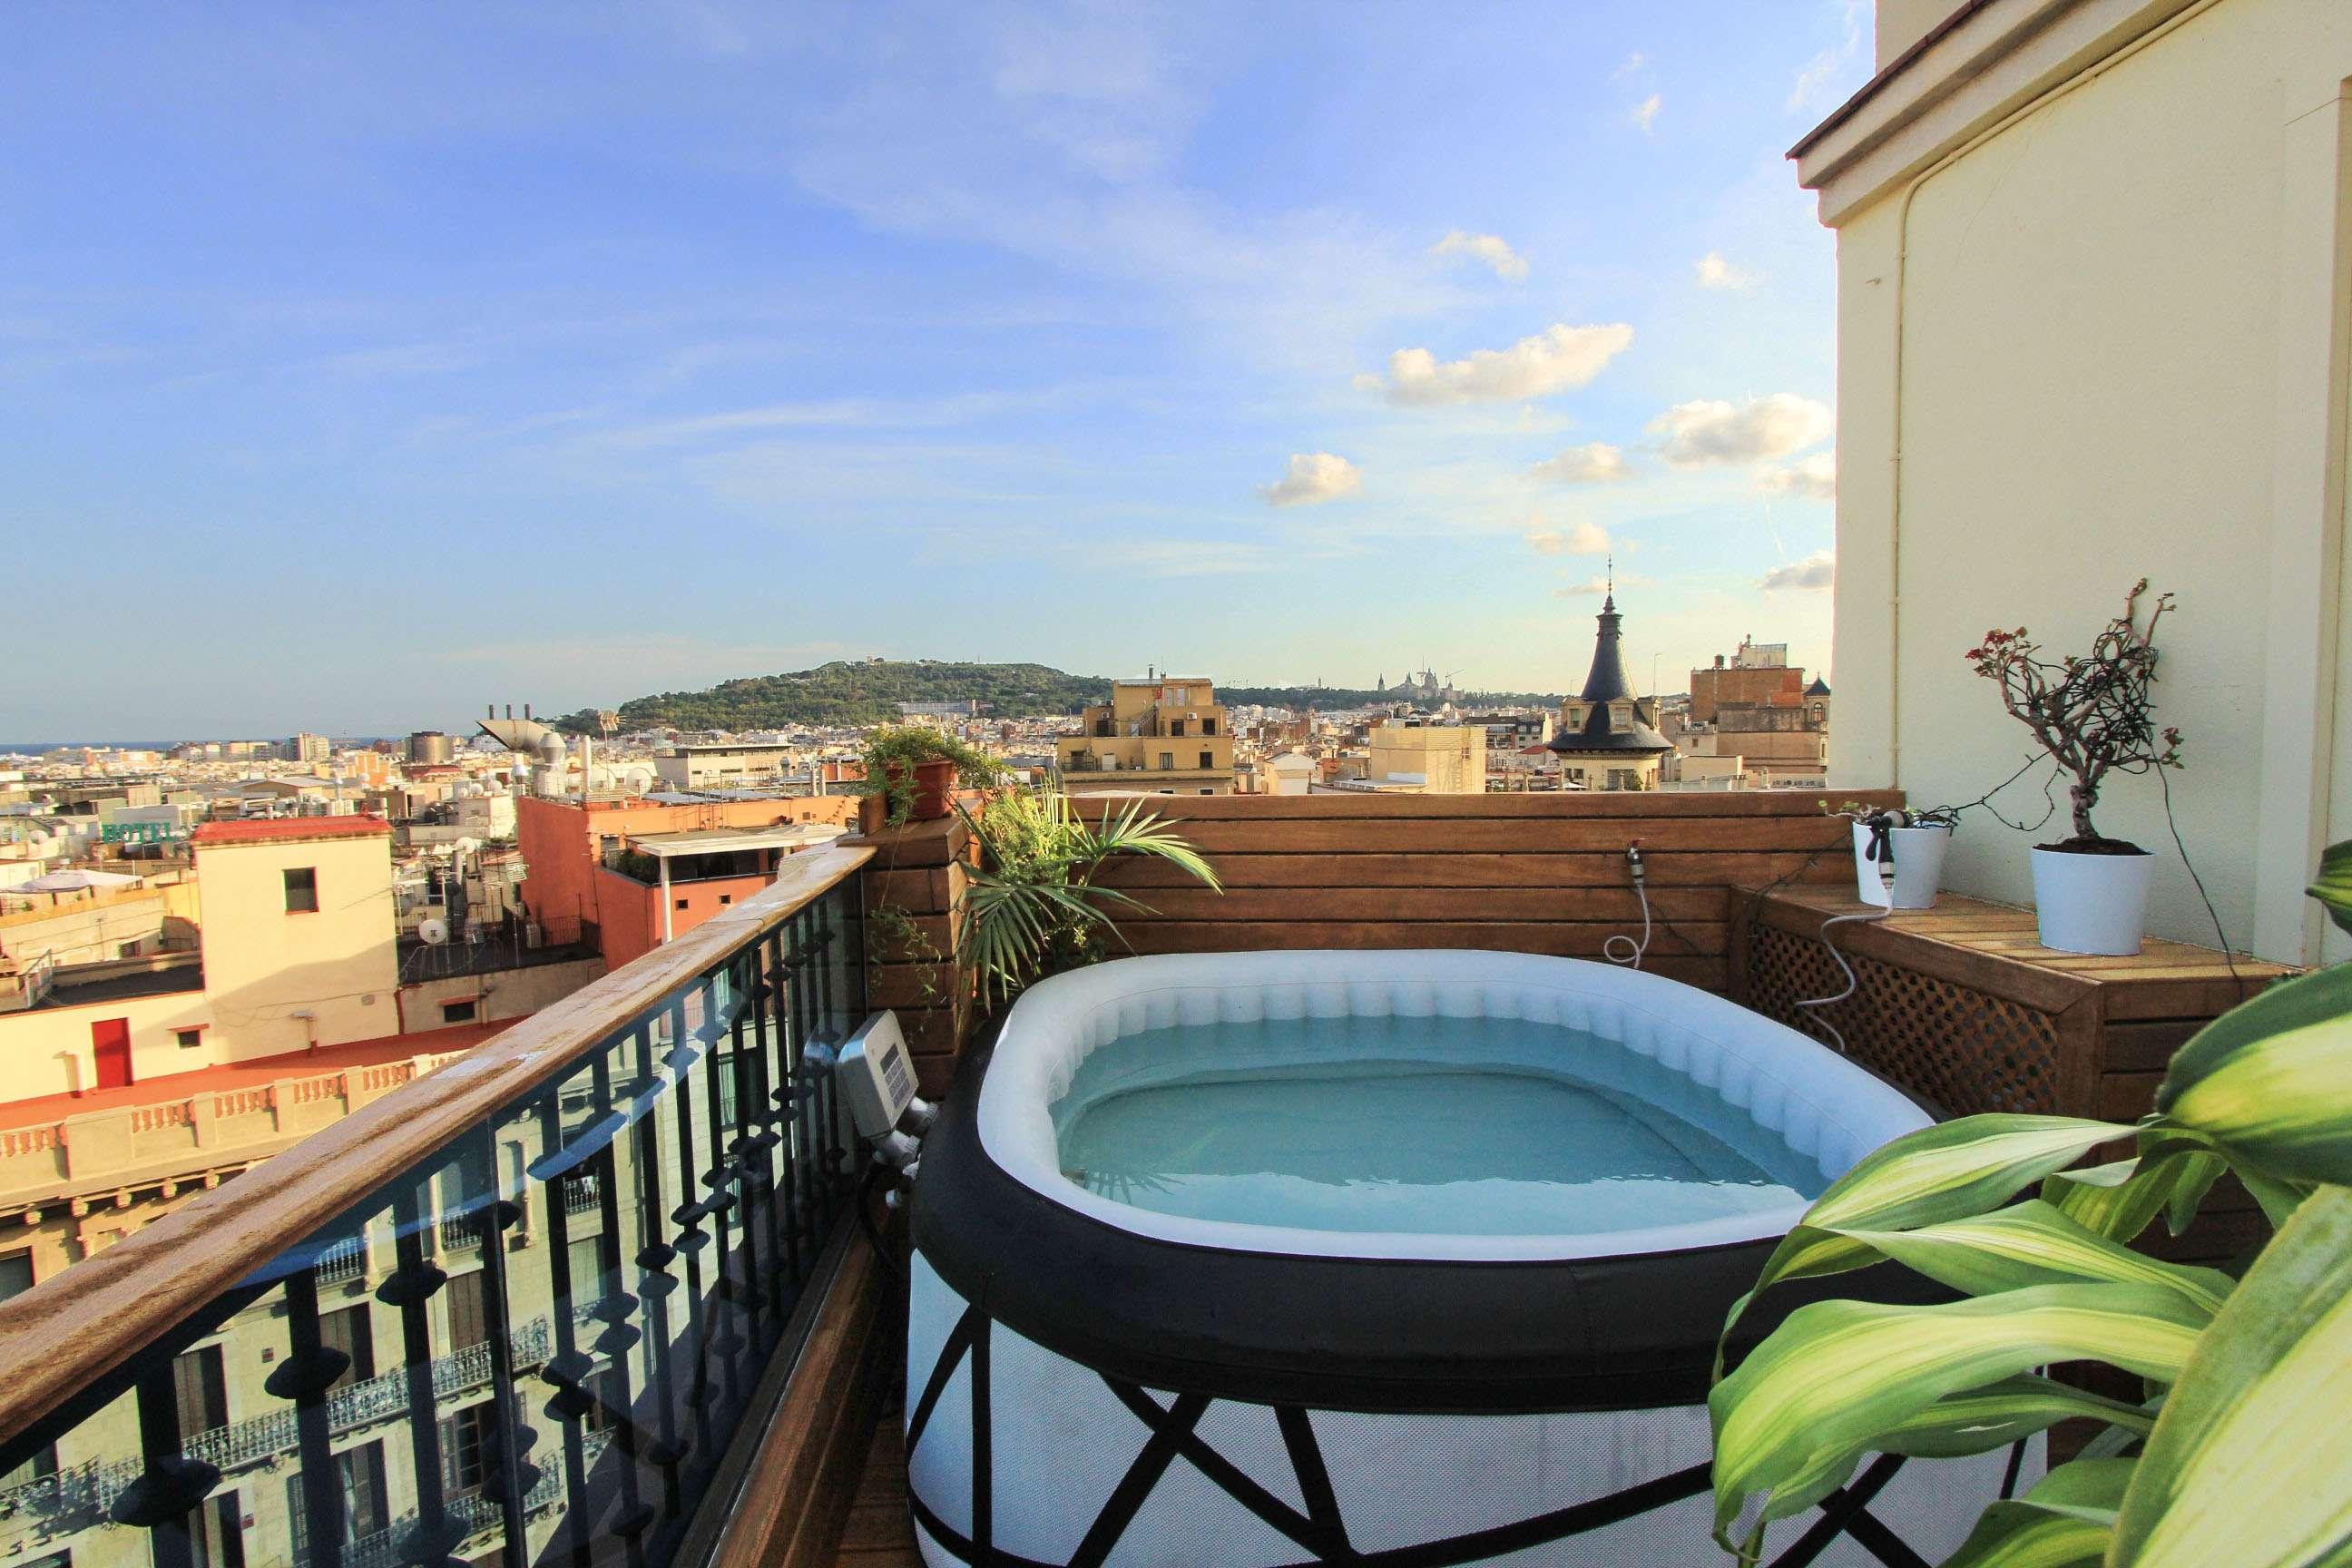 Attic penthouse with views of Plaça Catalunya